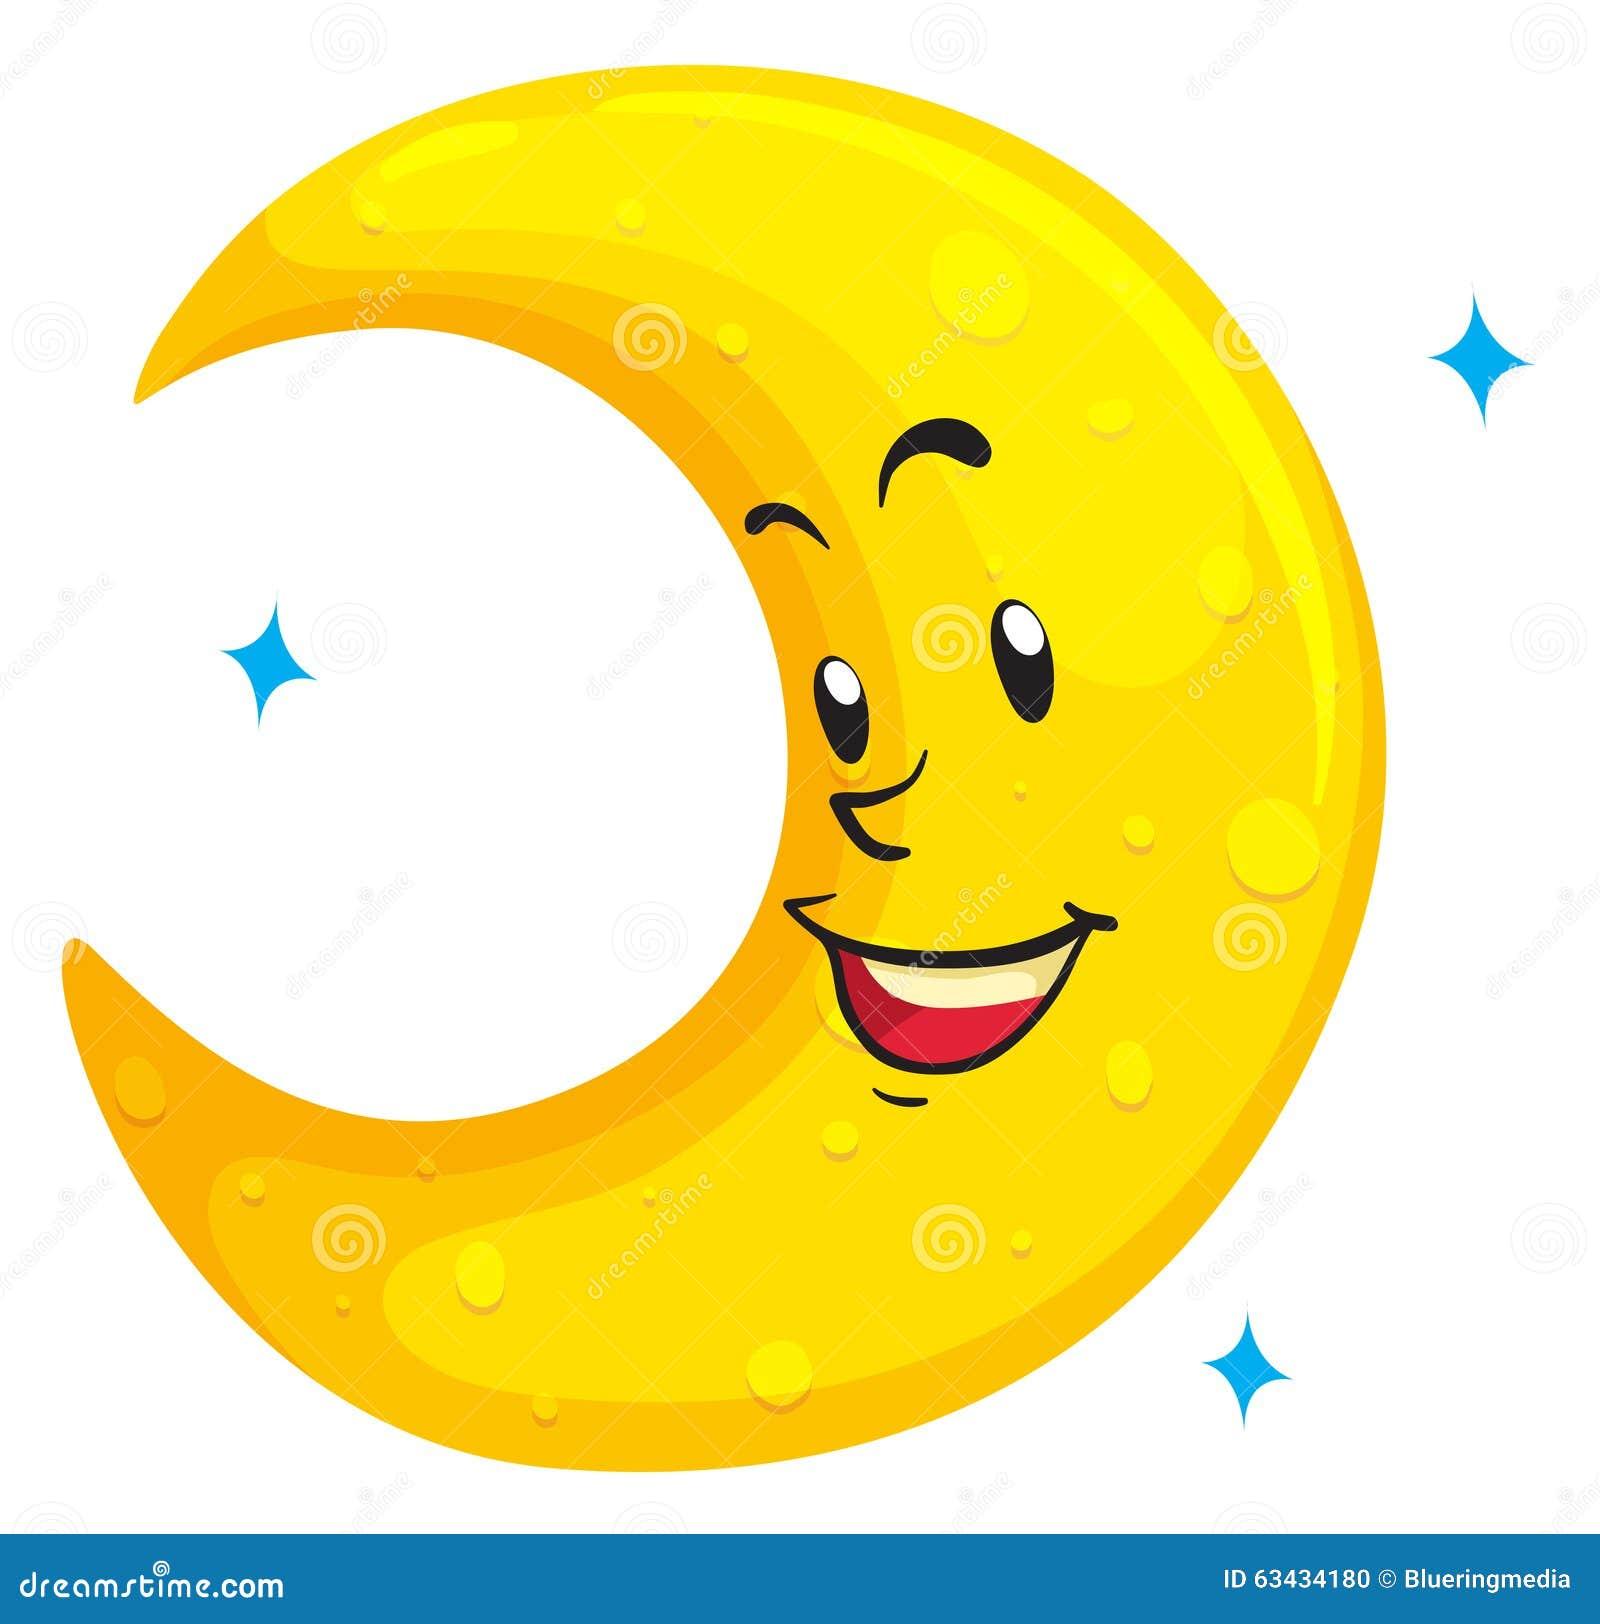 Clipart Sun Moon